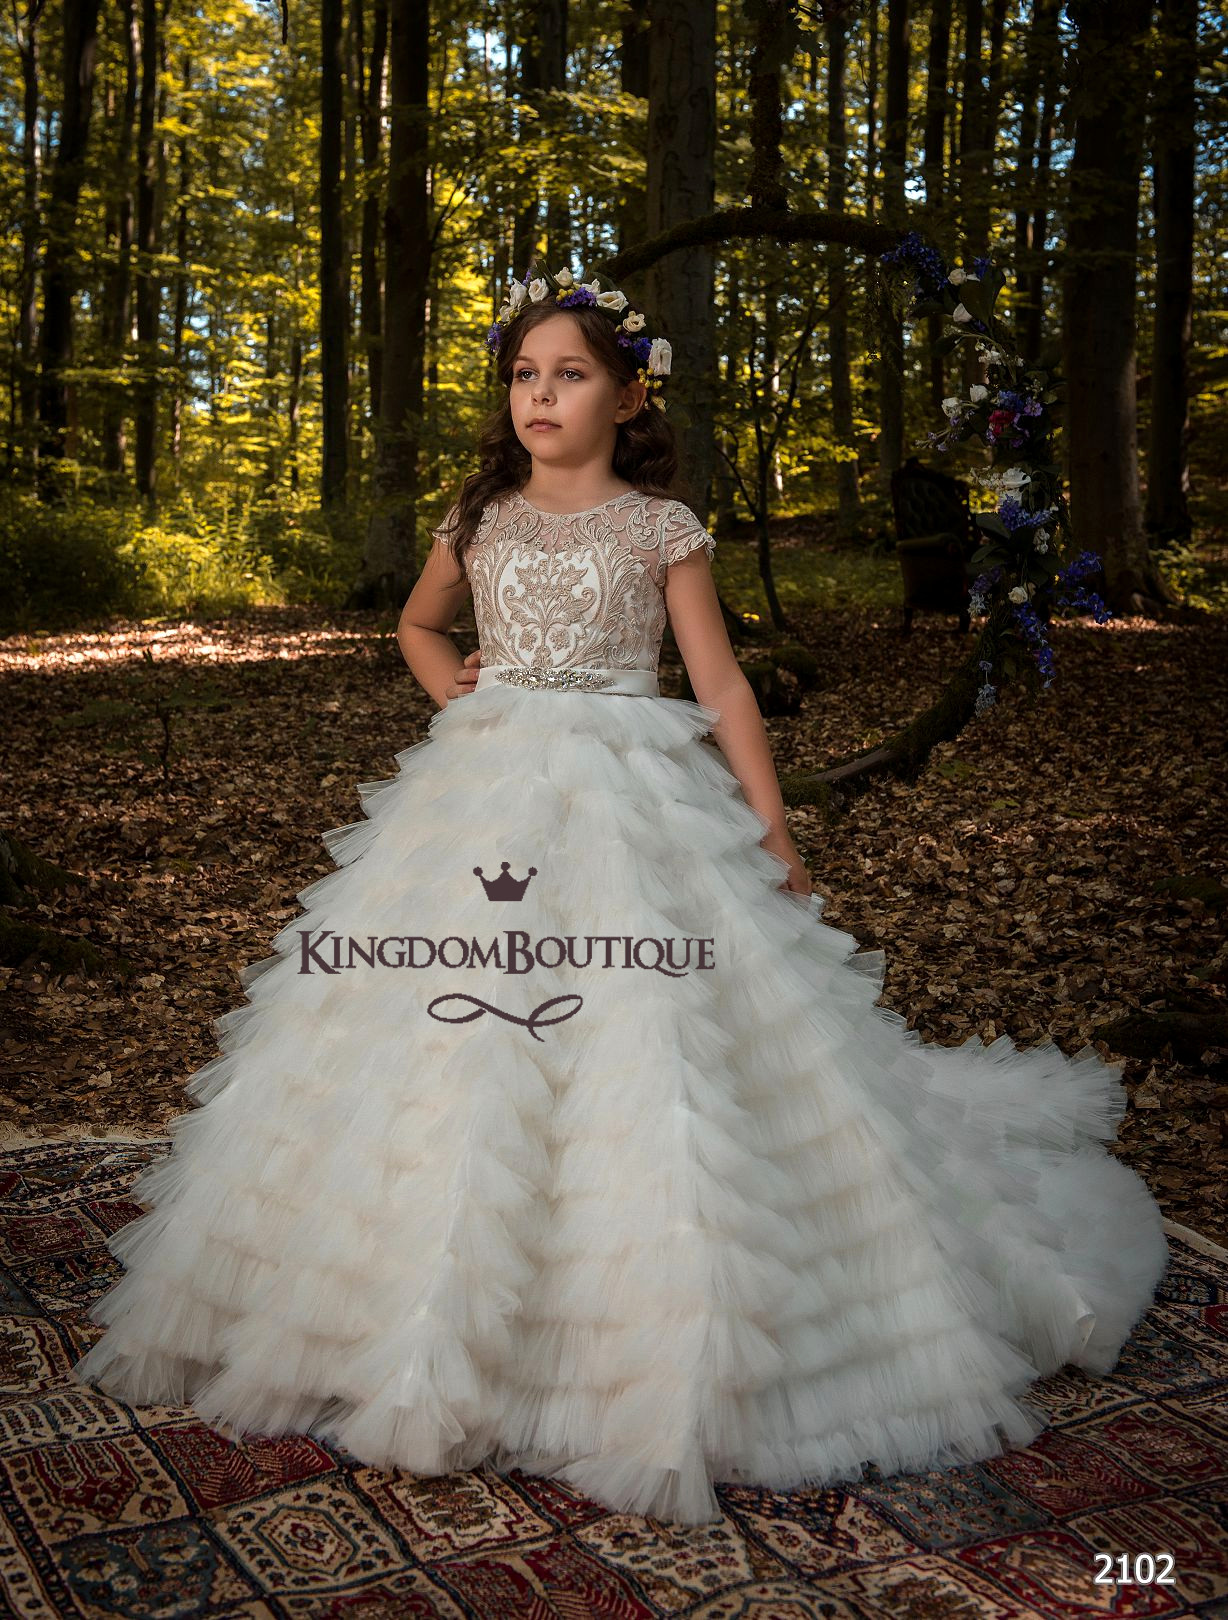 Enchanted forest - kingdom.boutique